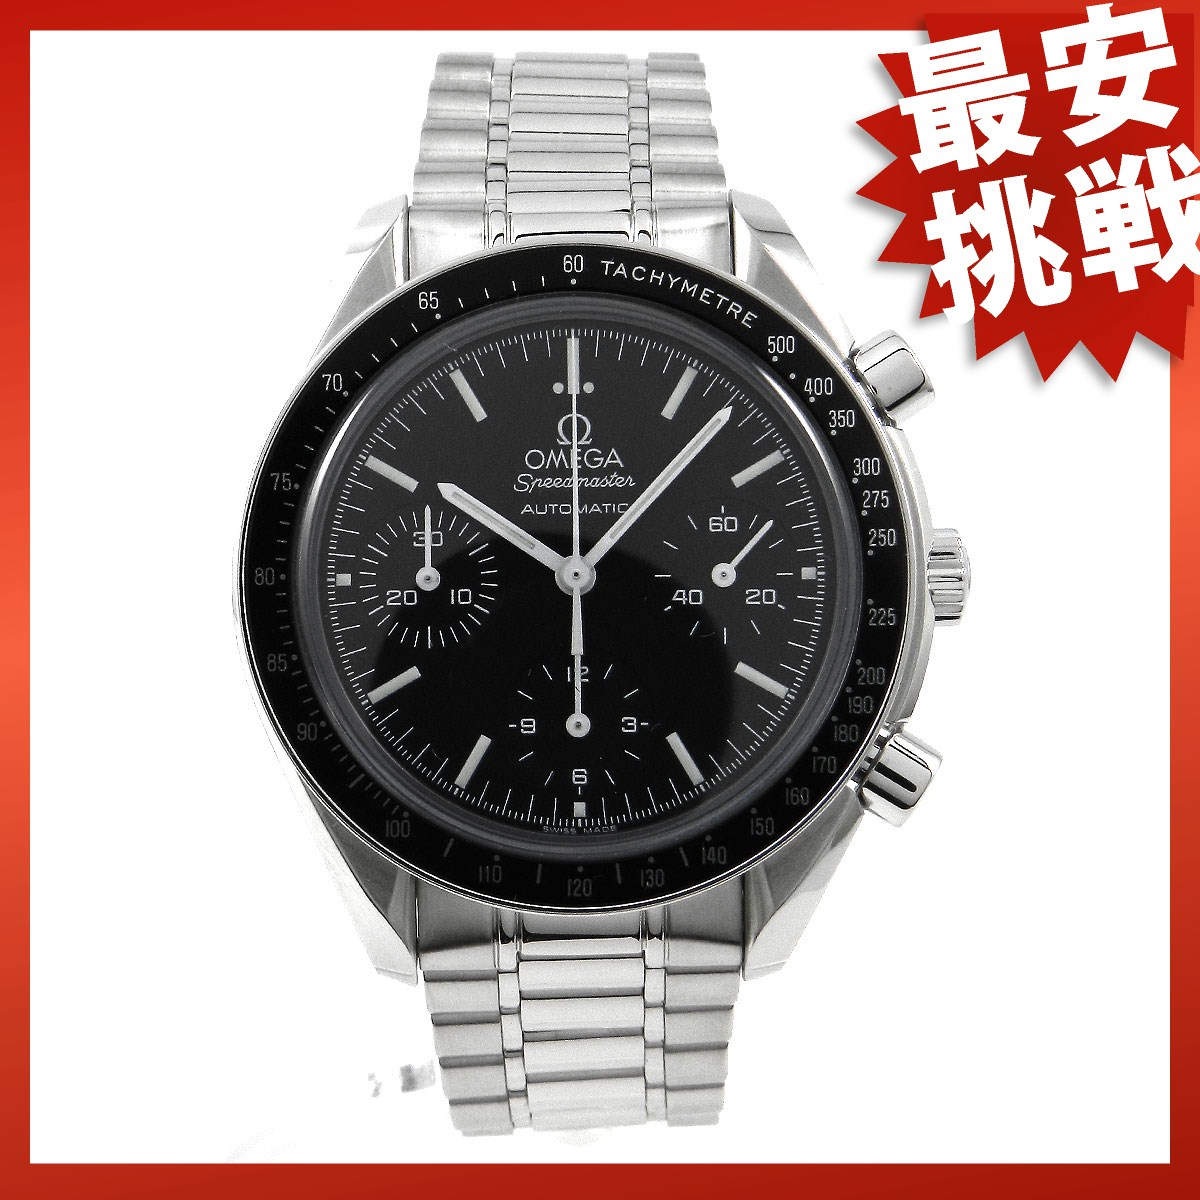 OMEGA Speedmaster 3539-50 men's watches